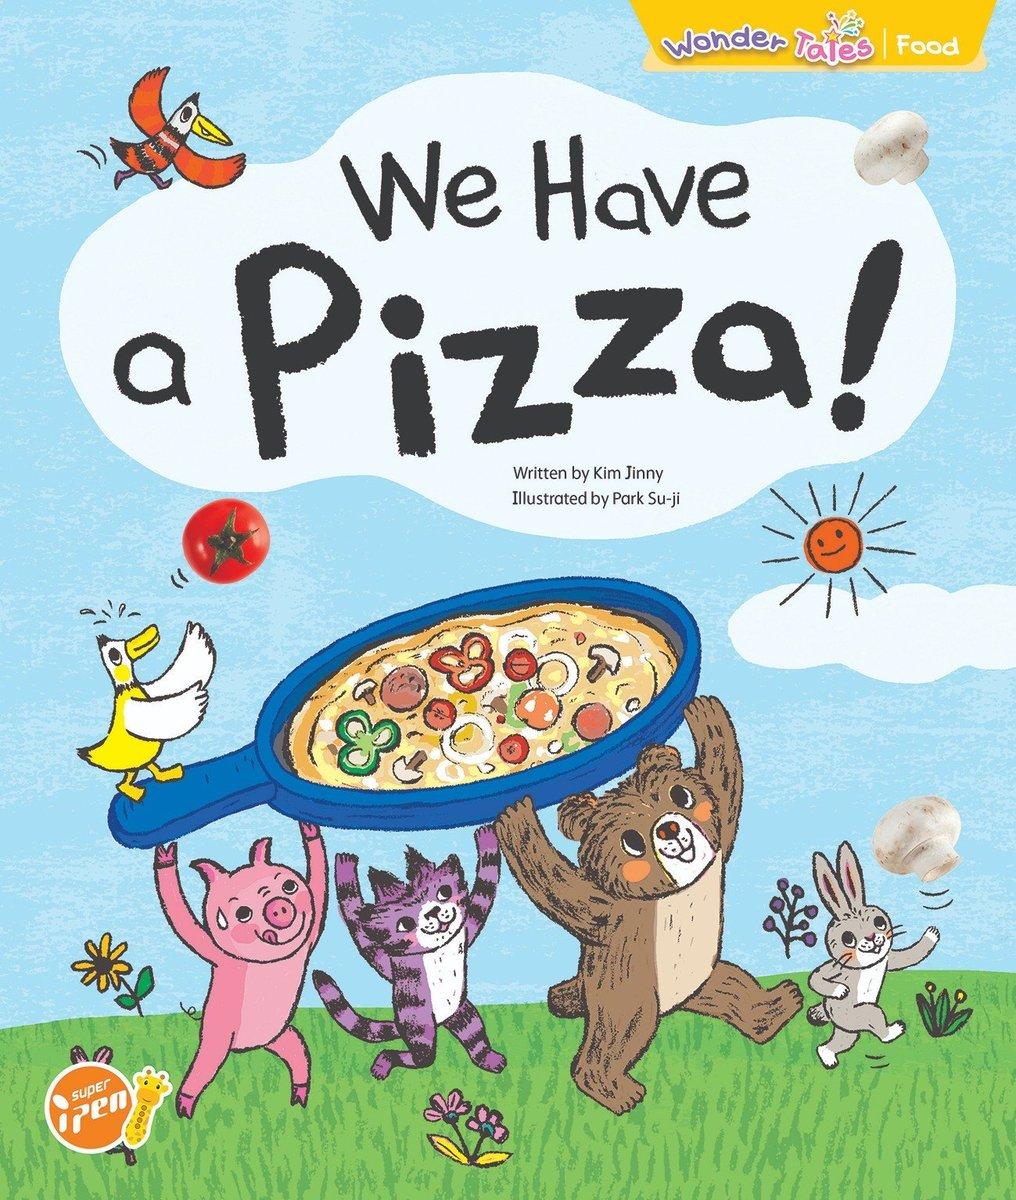 Wonder Tales 英文繪本 (K2)—We have a pizza!